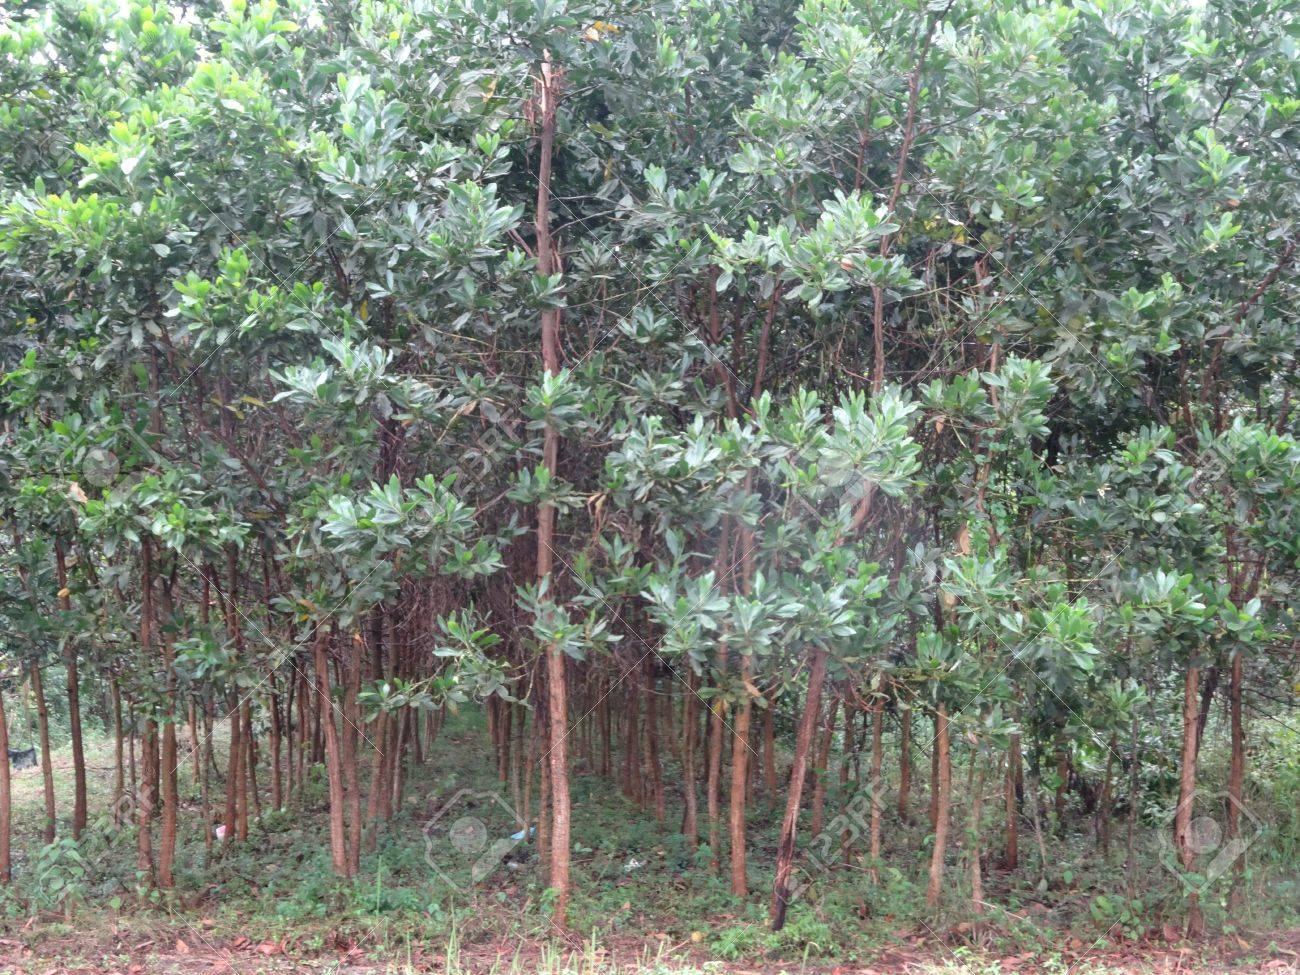 Acacia árbol De Reforestación De Cerca Malasia árbol Muebles De